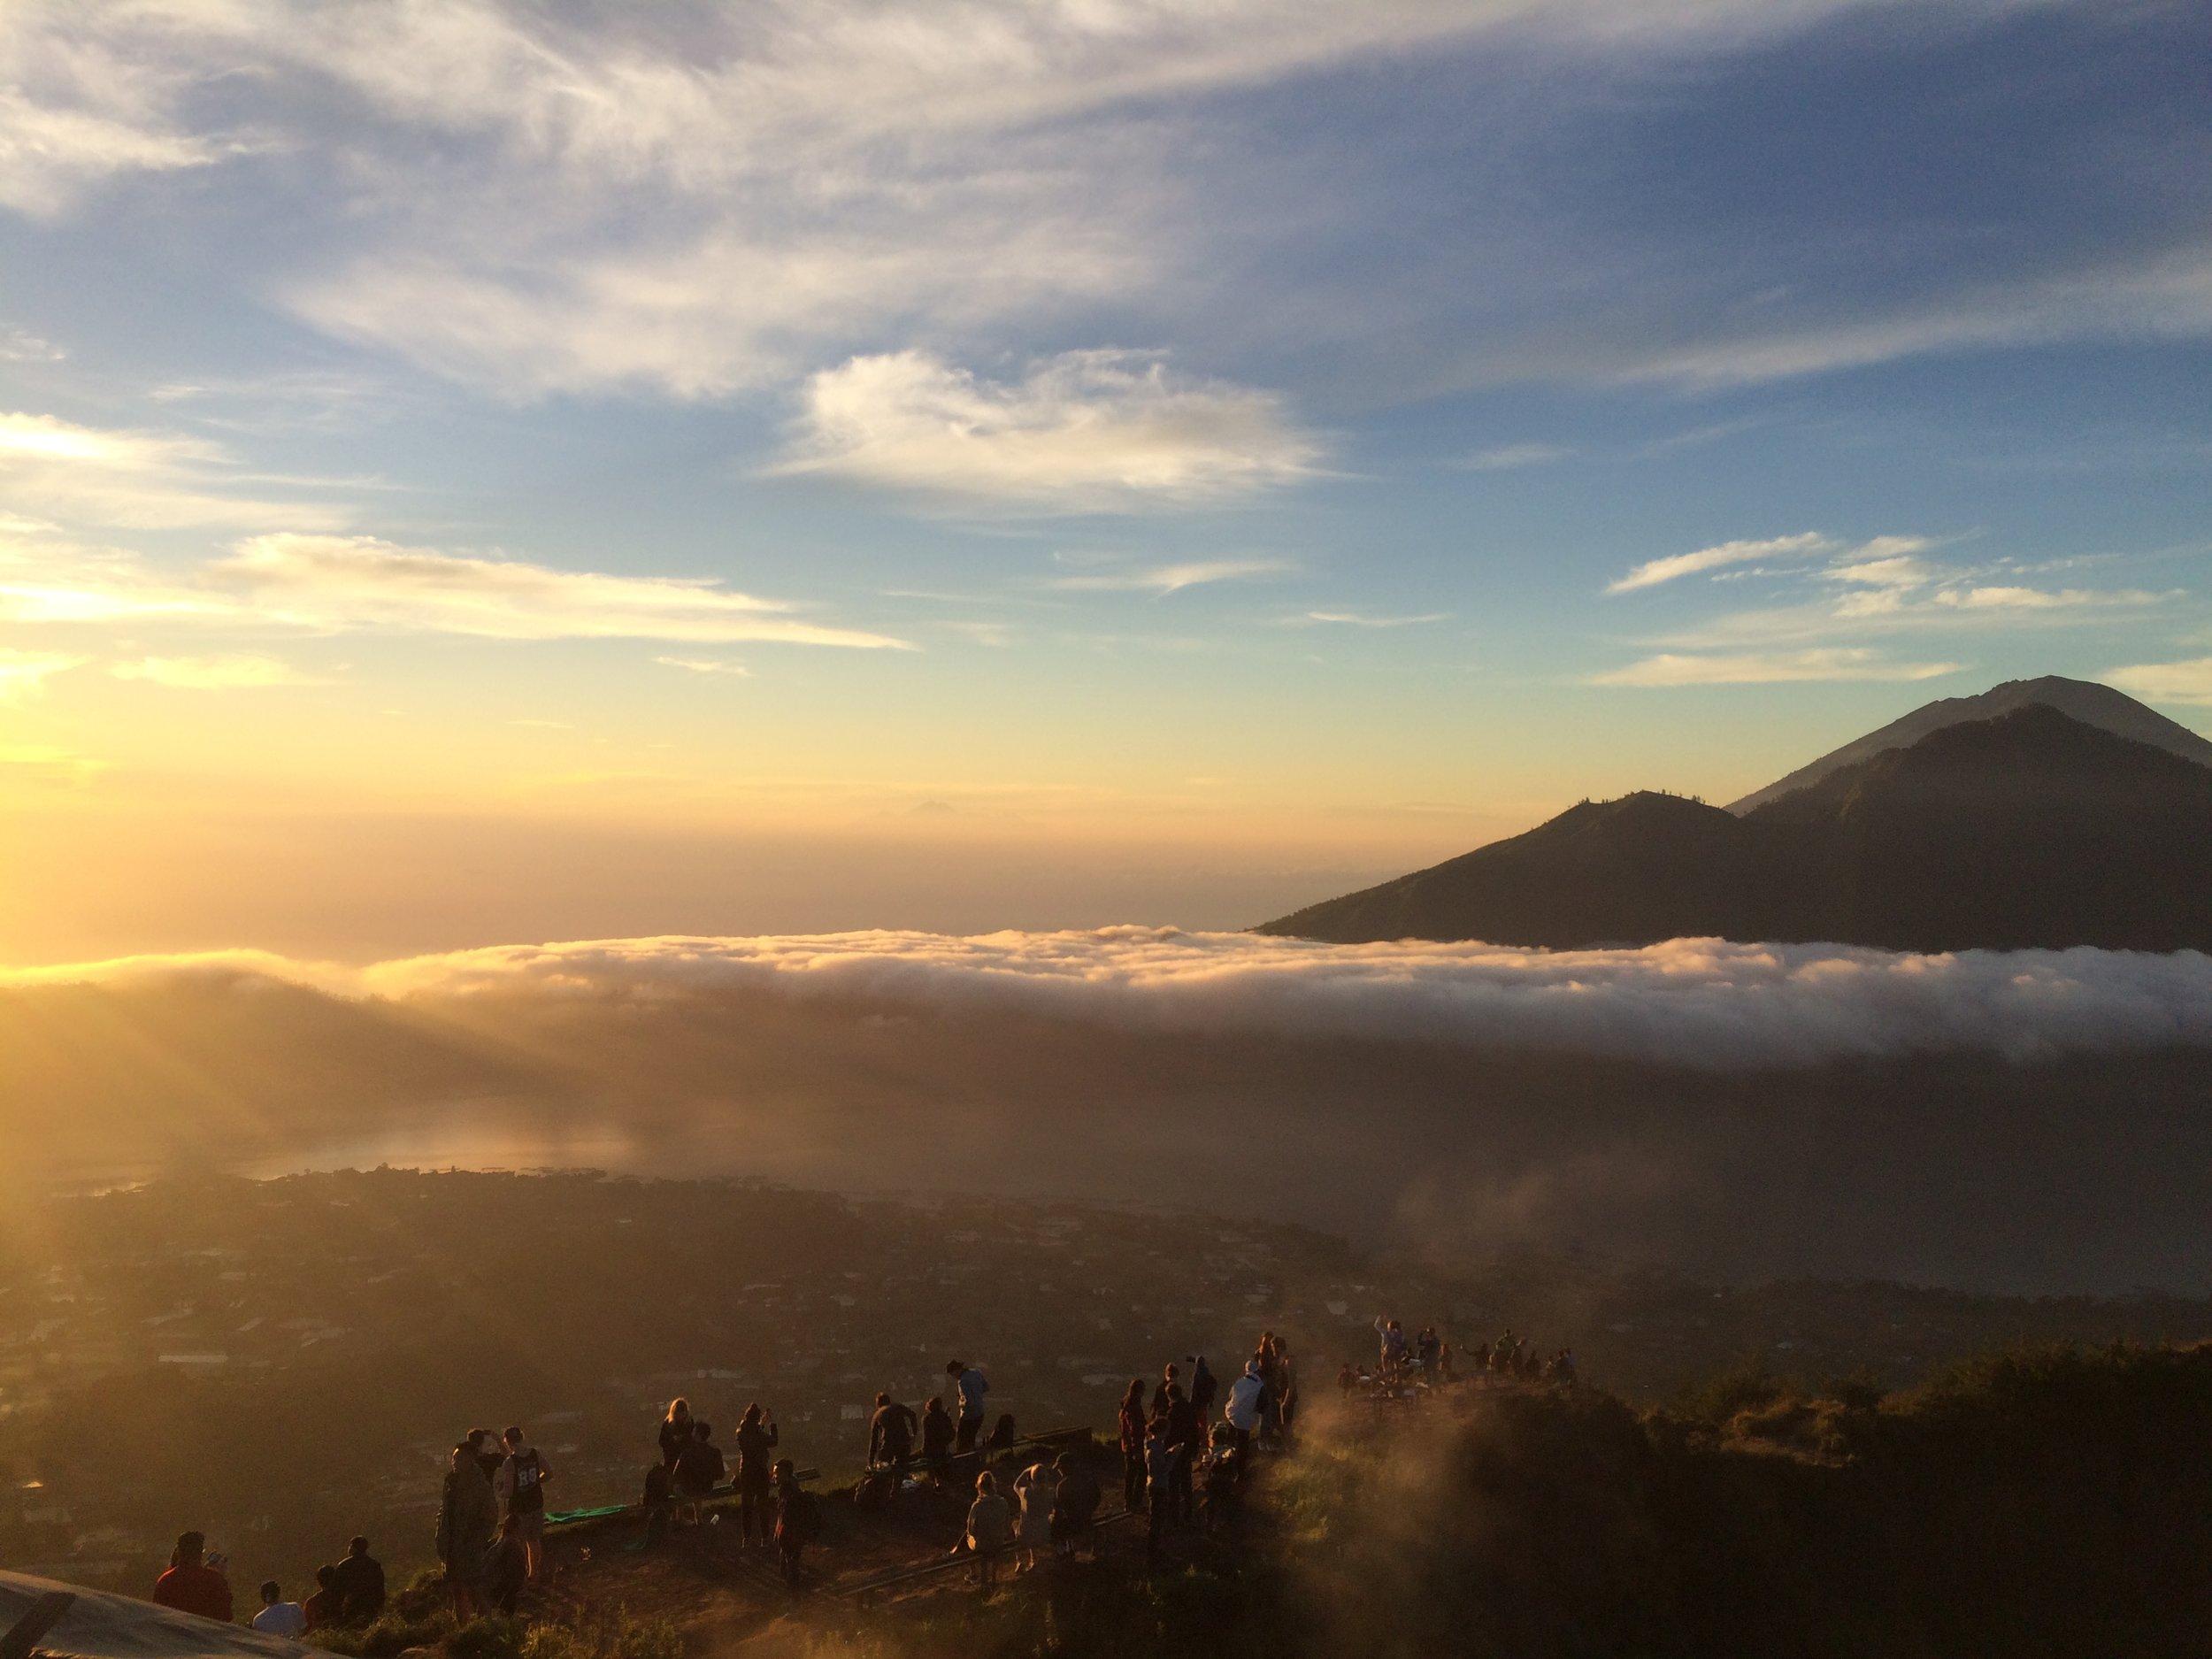 Sunrise on top of Mt. Batur.